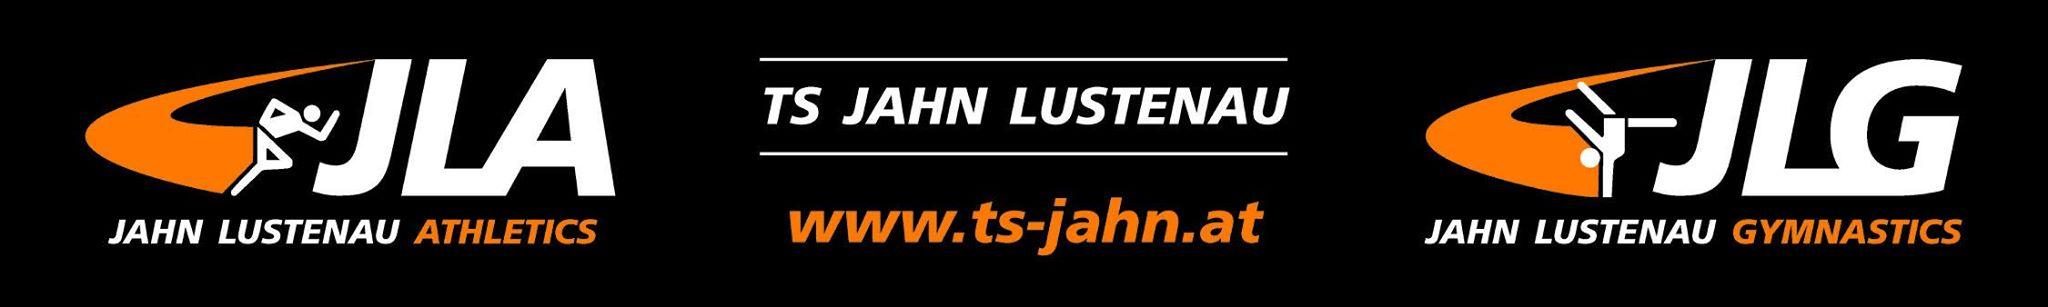 TS-Jahn Lustenau